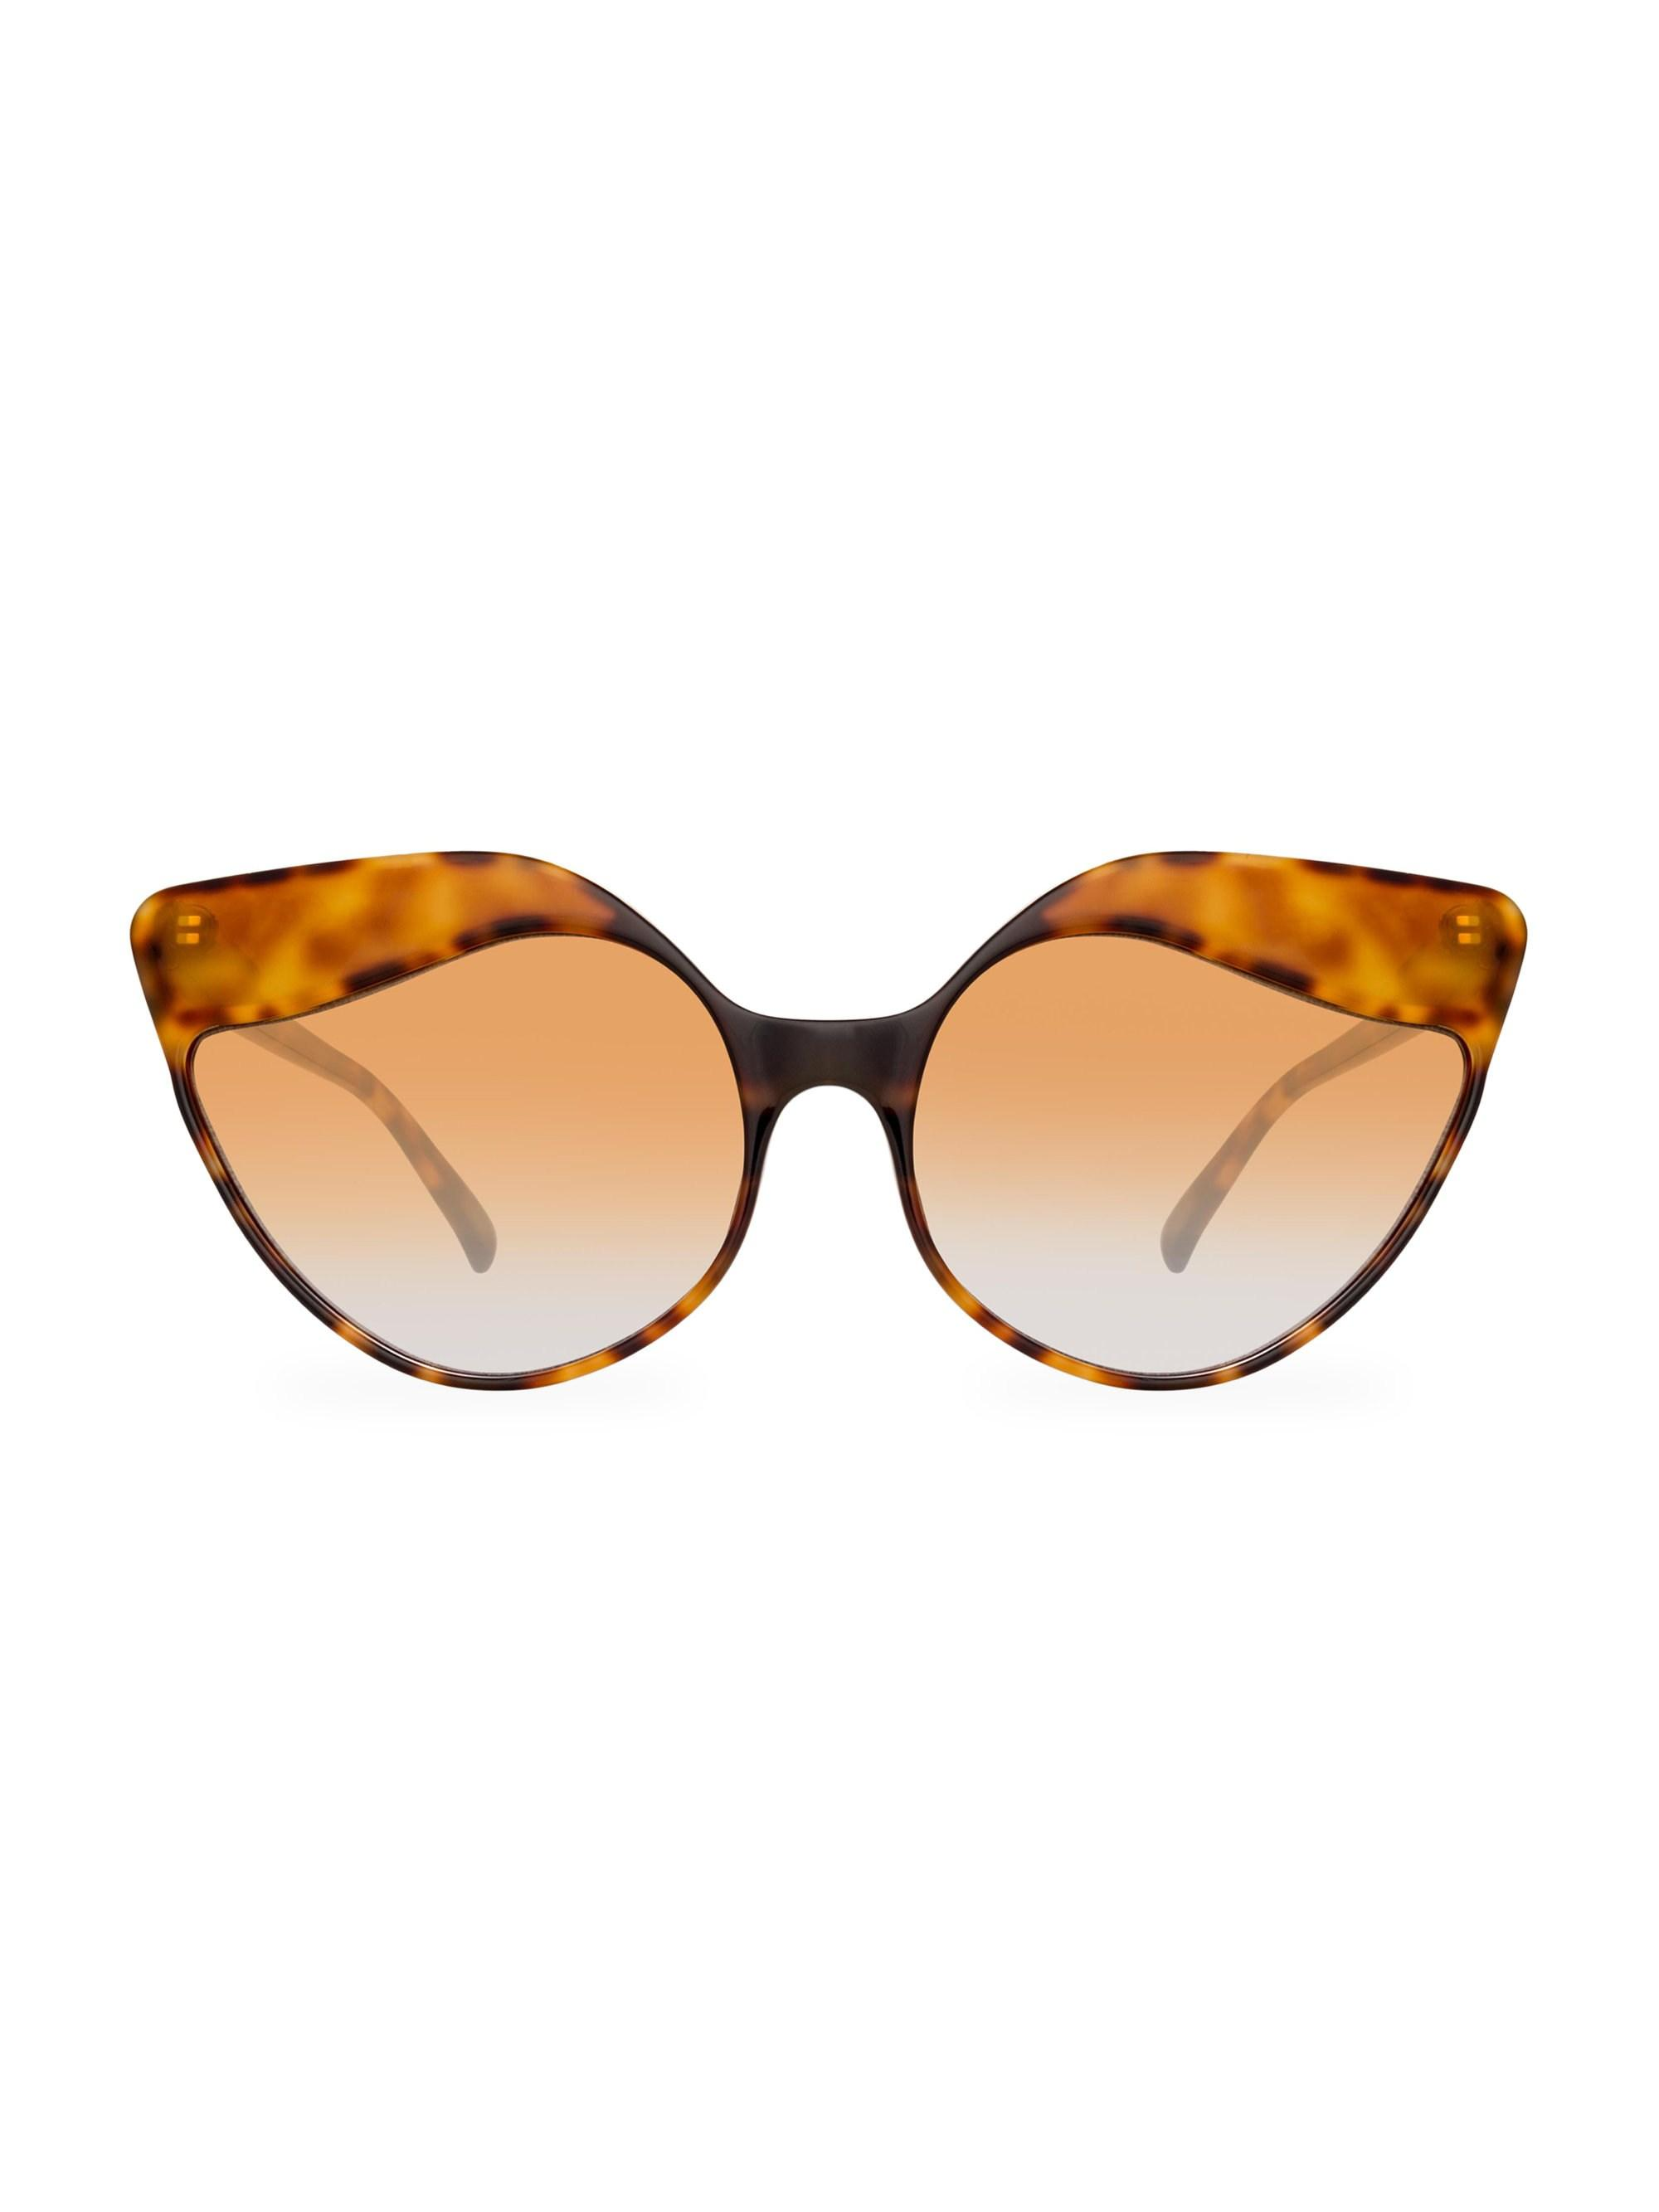 4c783dc4c9 Lyst - Linda Farrow Oversized 59.5mm Cat Eye Sunglasses in Brown